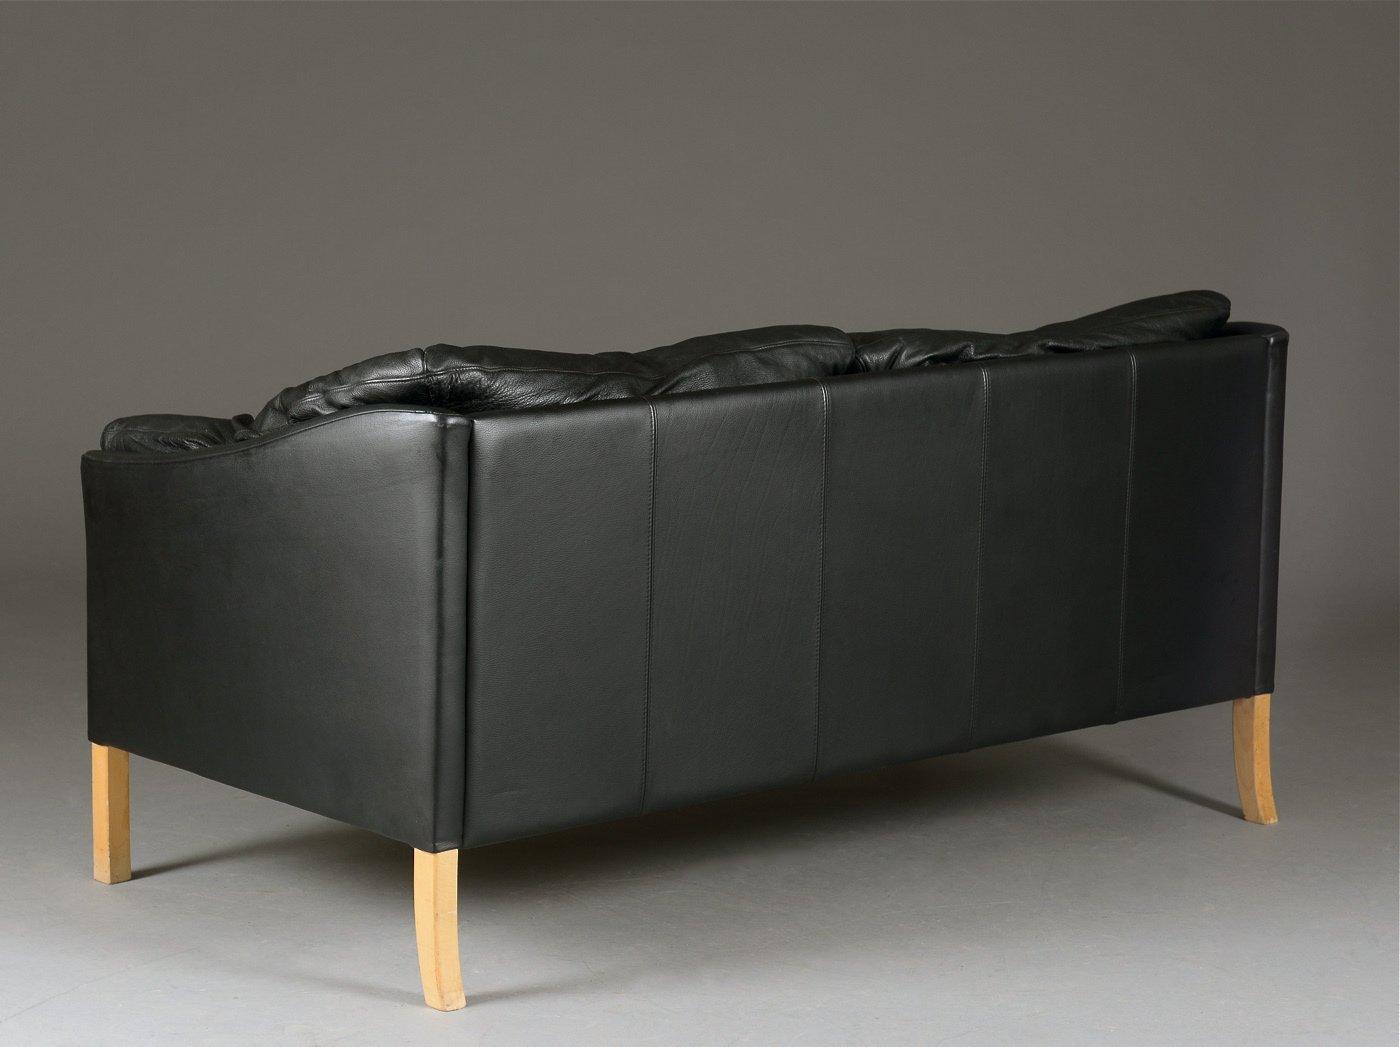 Danish Black Leather Sofa 1980s for sale at Pamono